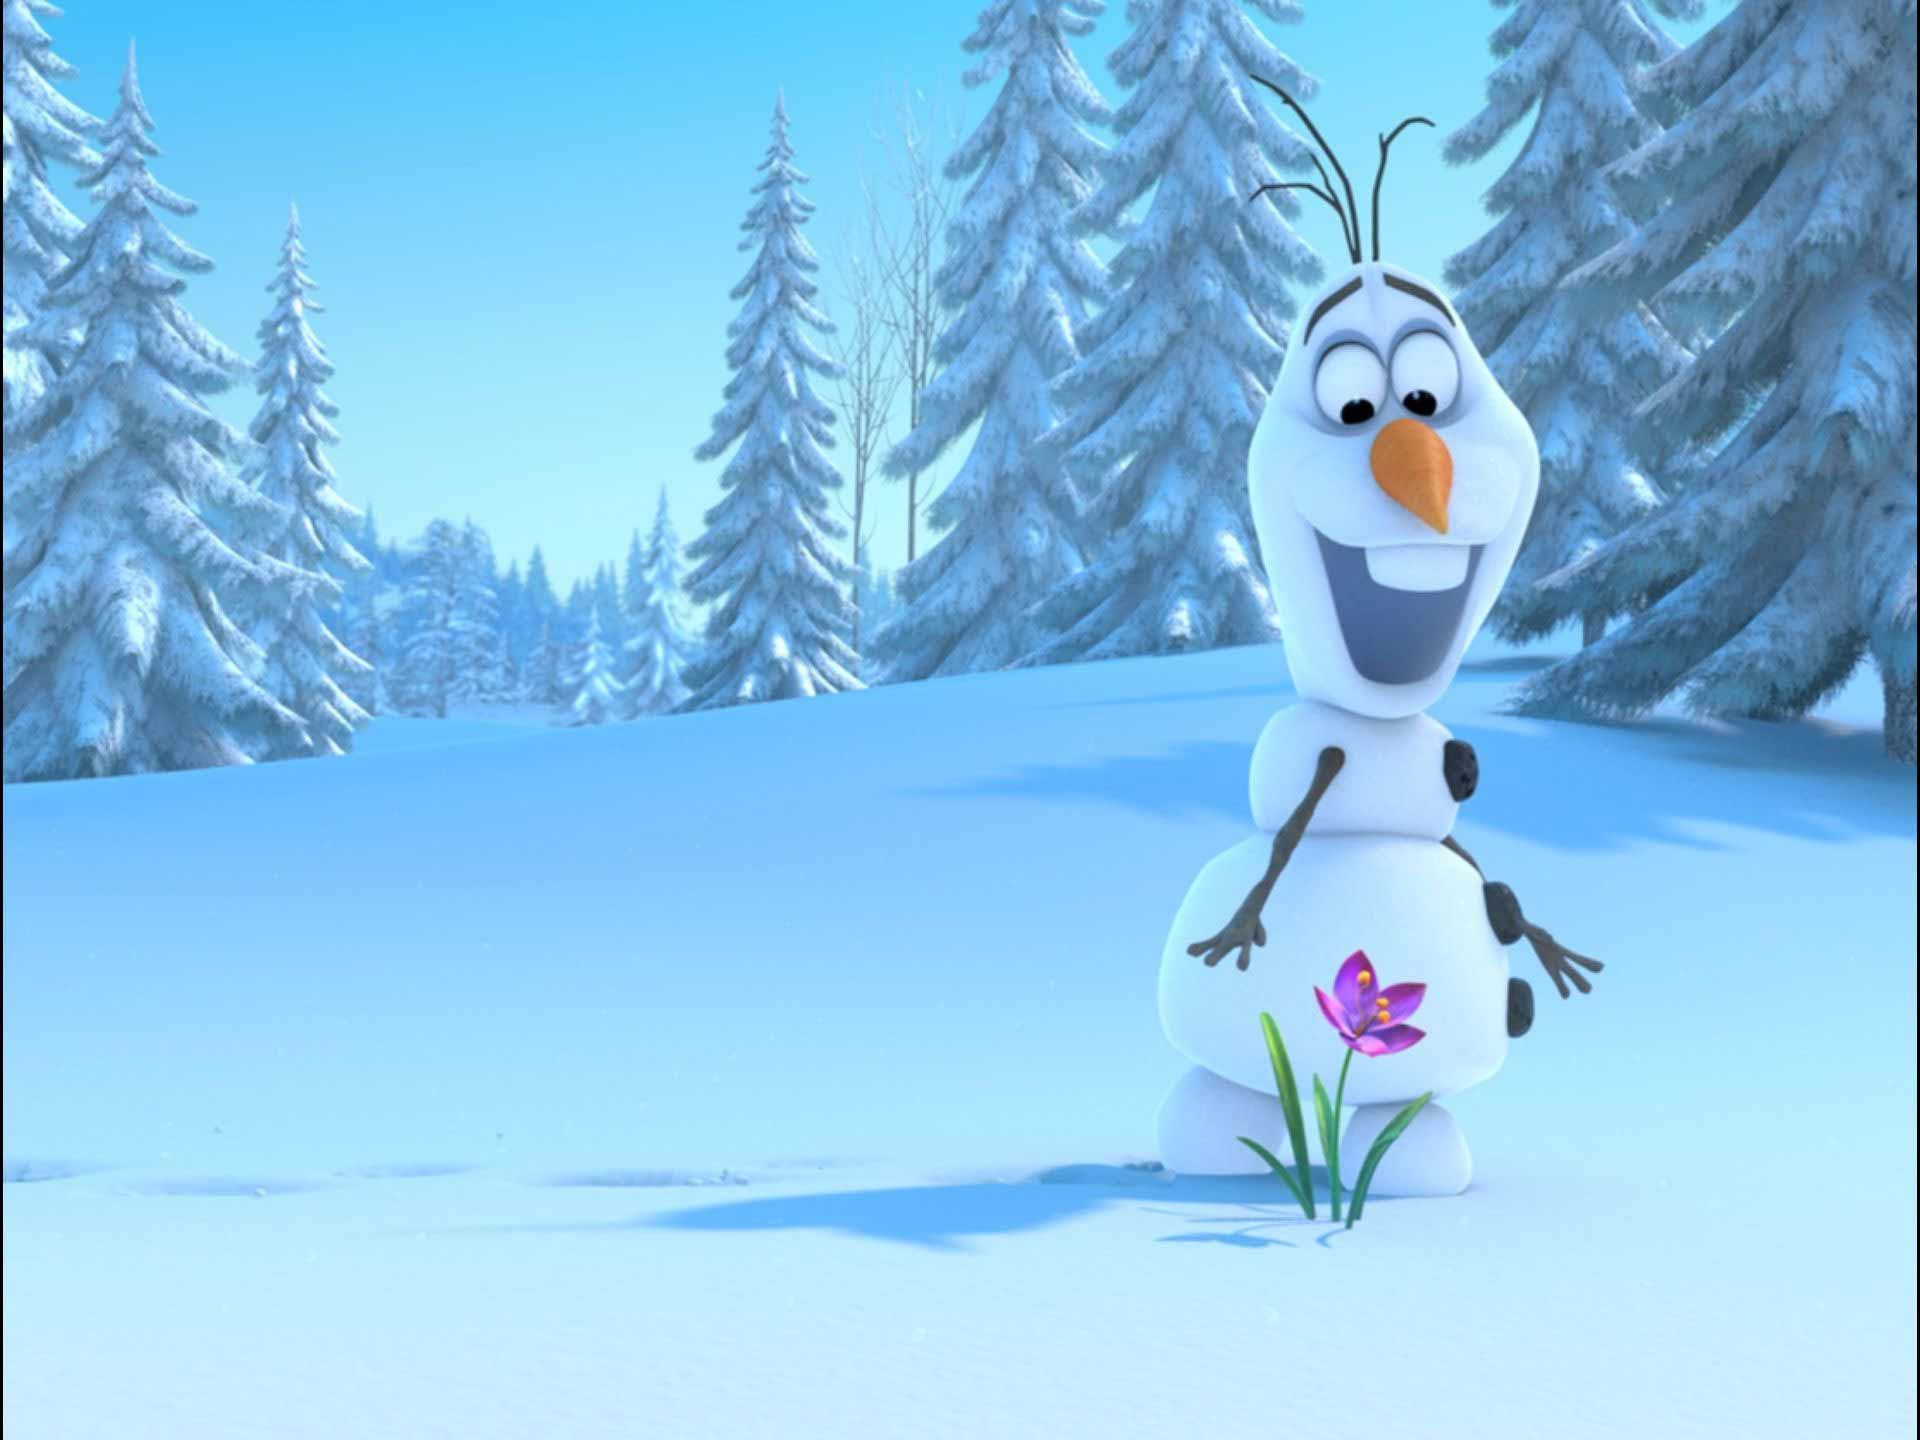 frozen 2013 desktop backgrounds anna frozen movie wallpapers free 1920x1440